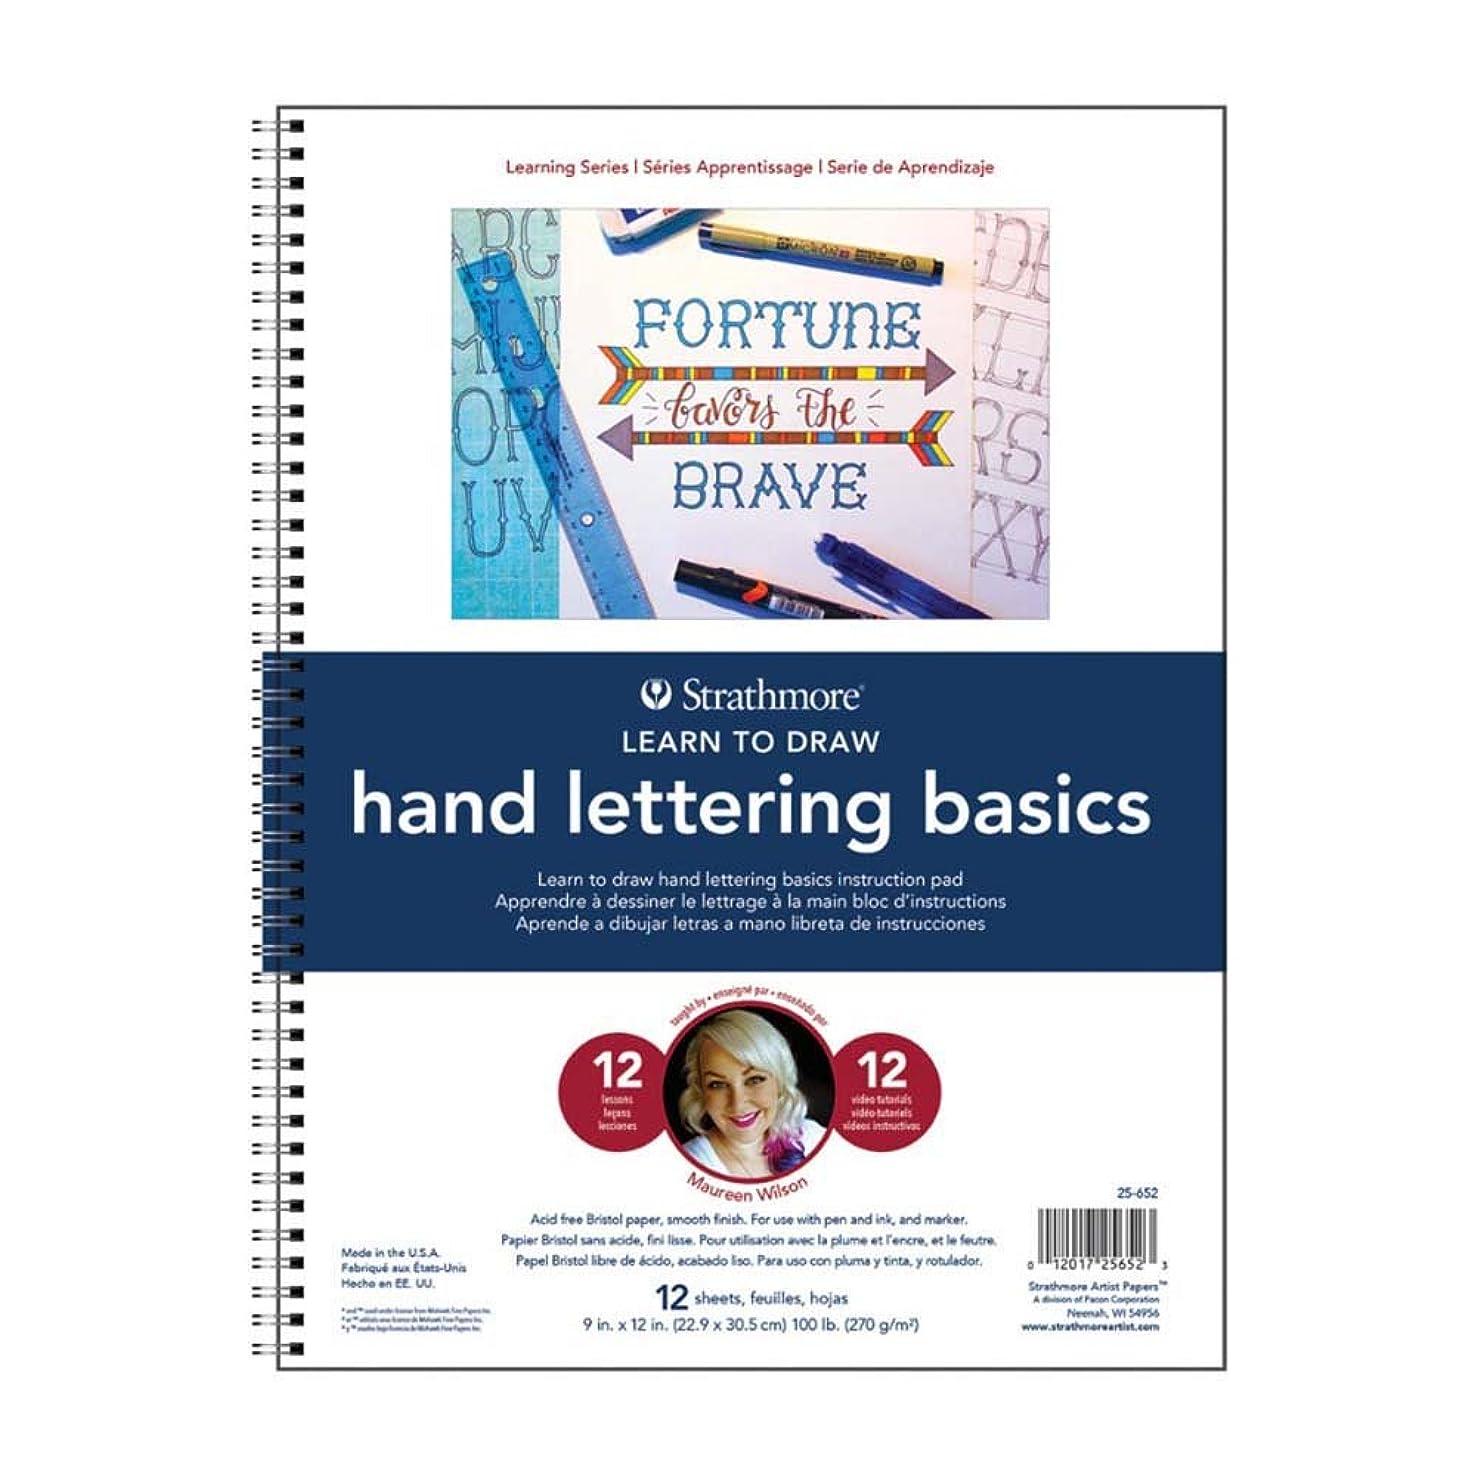 Strathmore ((25-652 200 Learning Series Hand Lettering Basics Pad